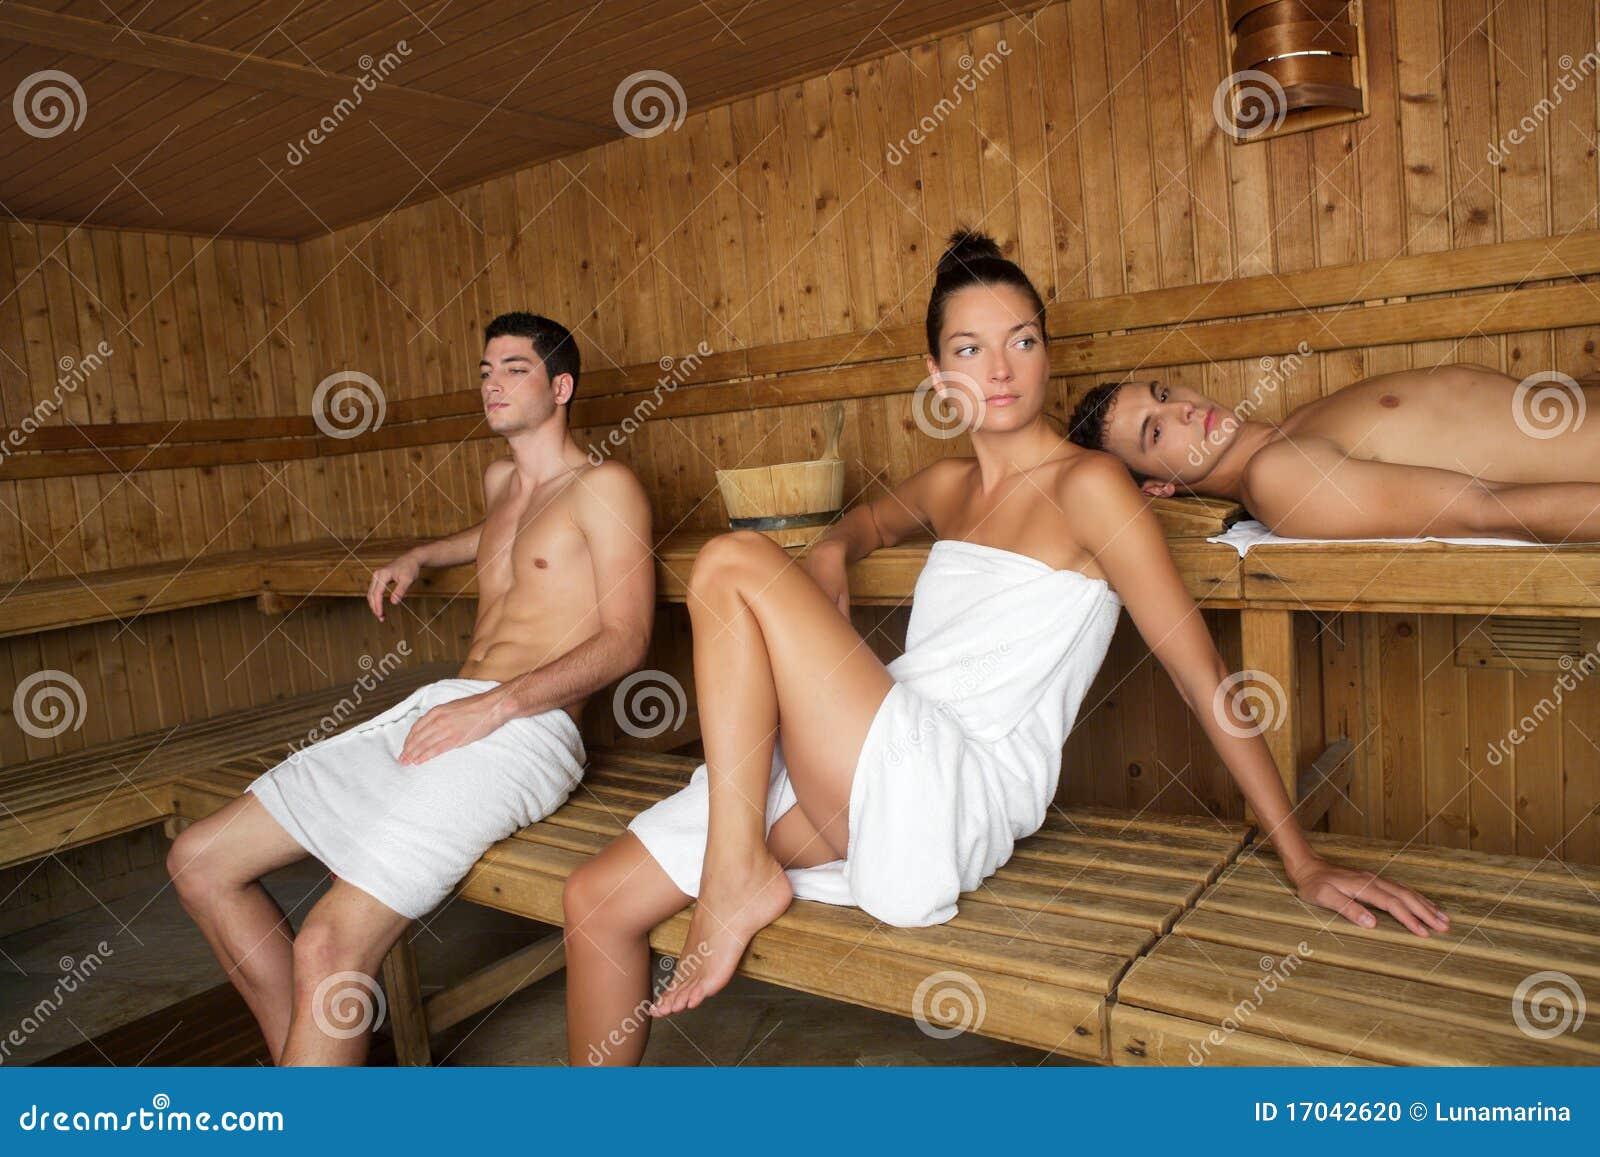 Vintage Russe Porno vidos, Russe sexe - Tubevintageporncom